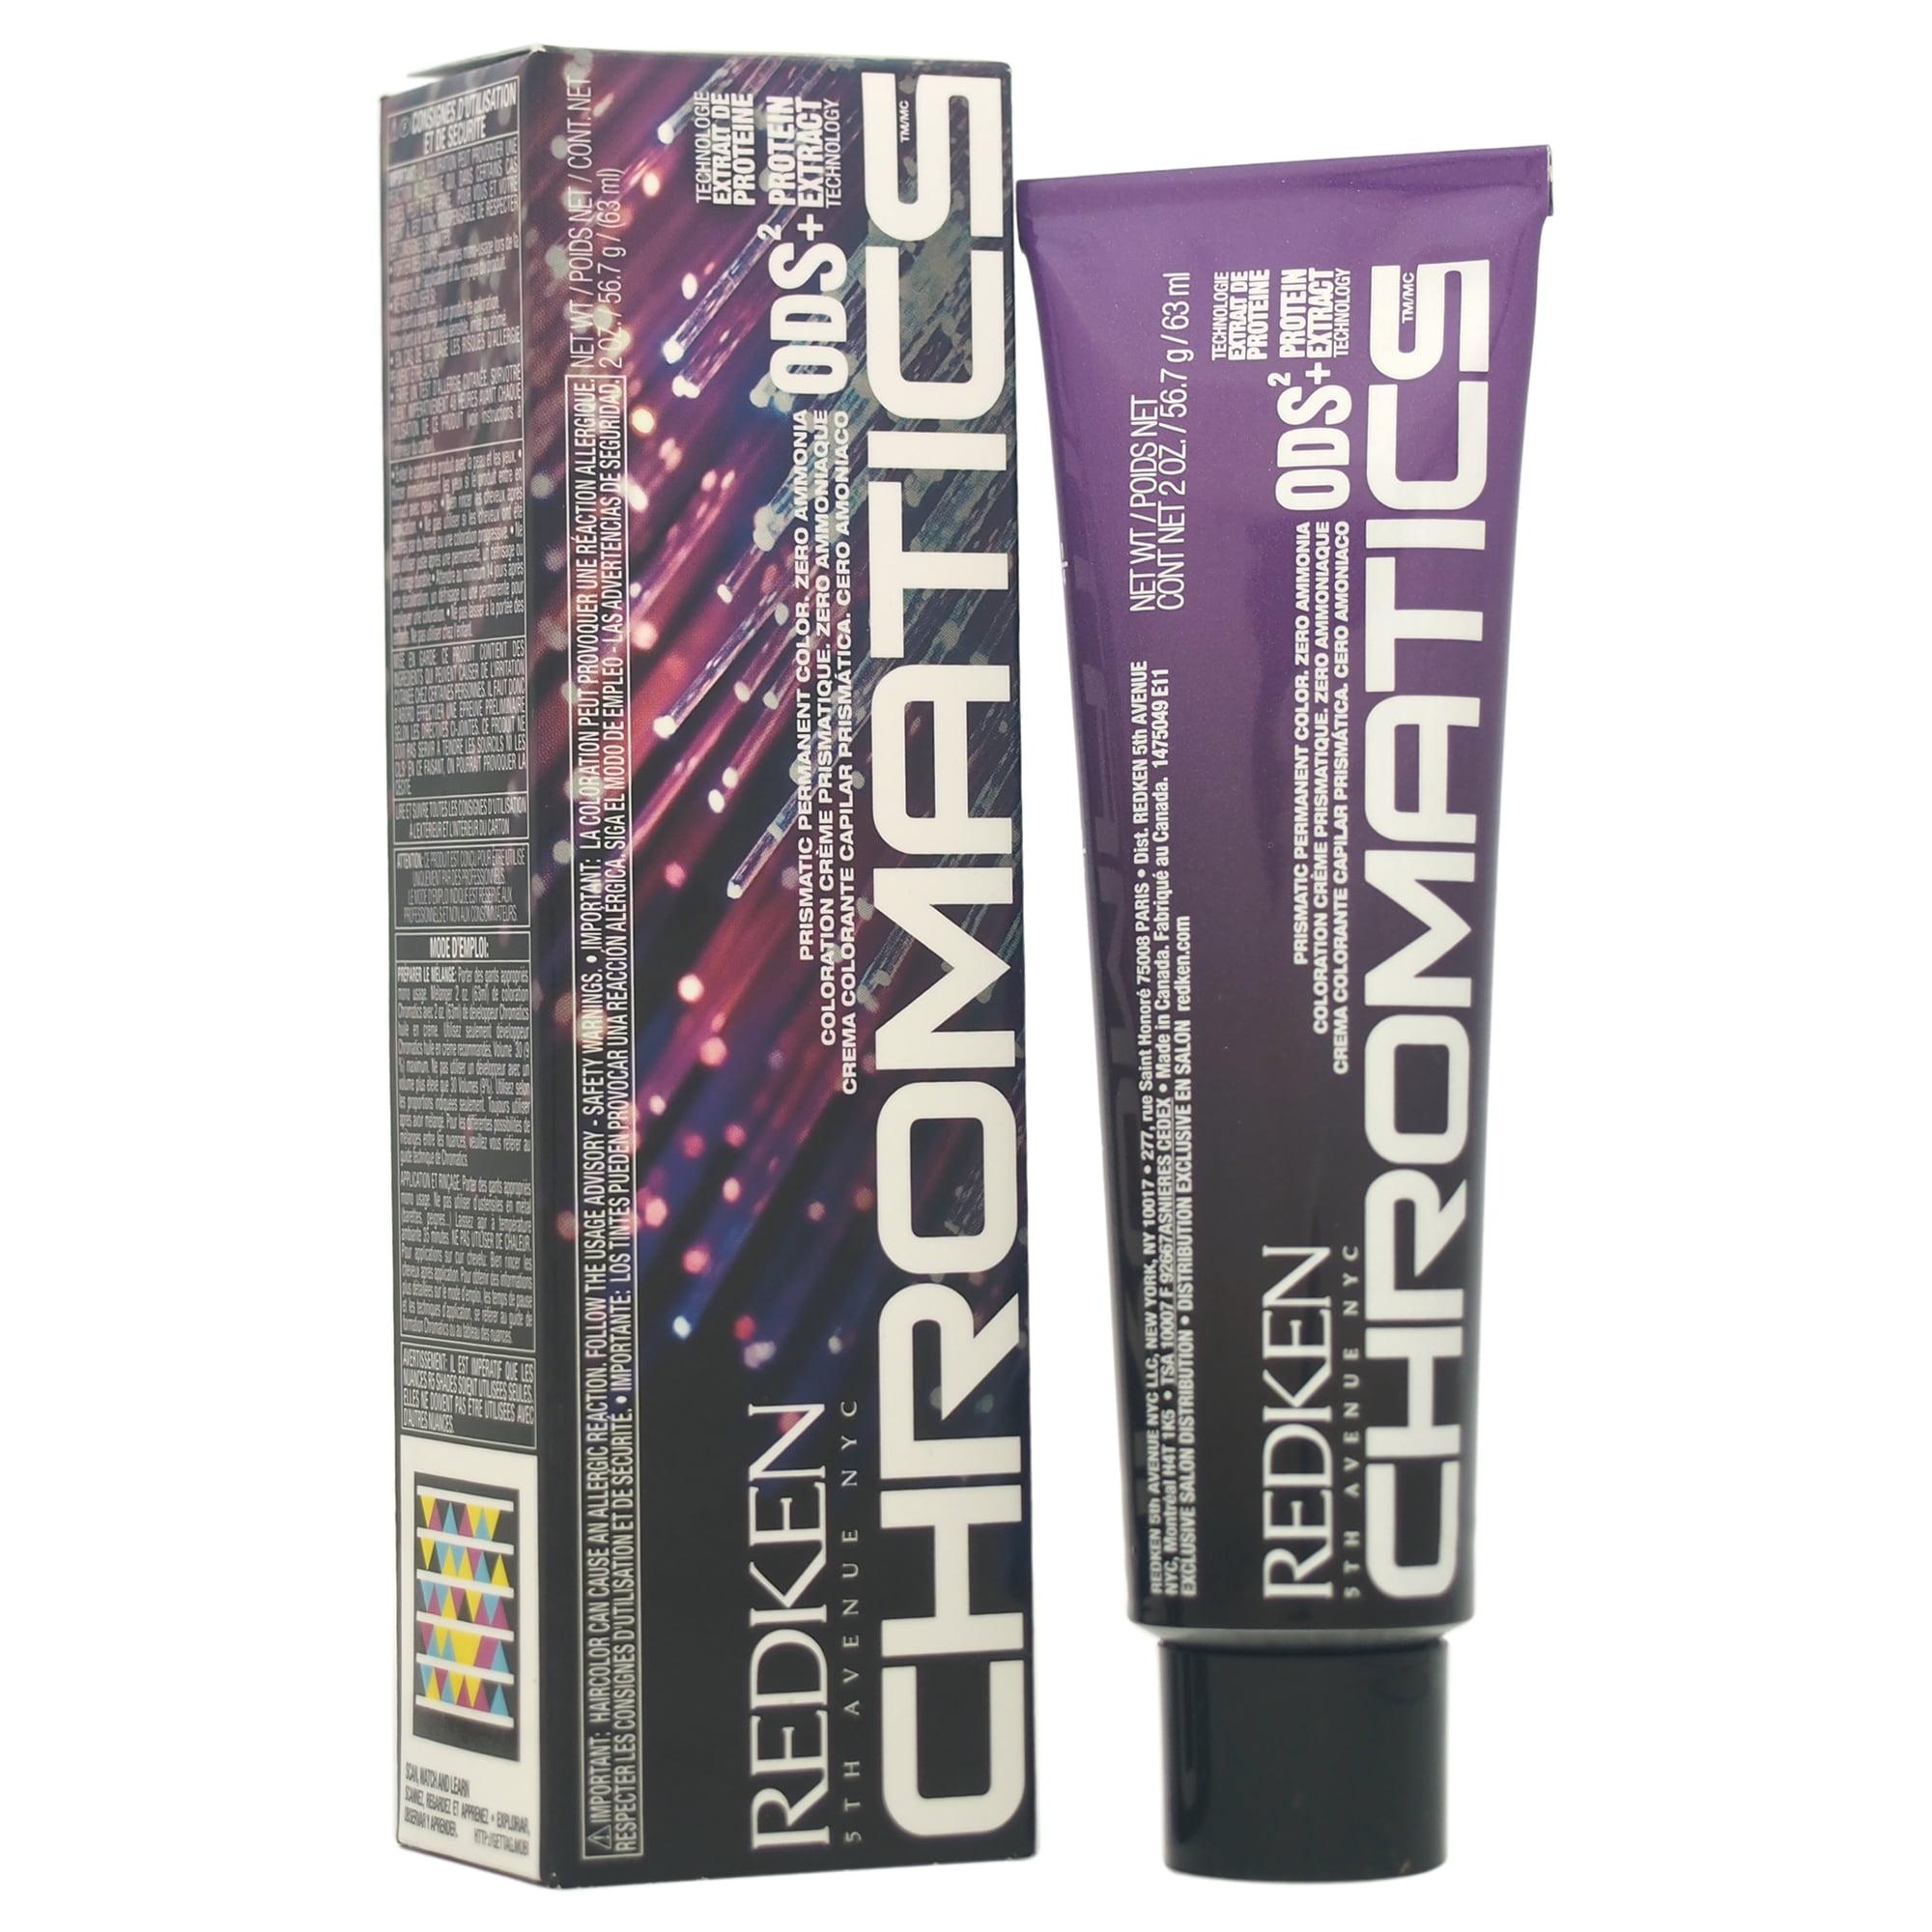 Redken Chromatics Prismatic Hair Color 4vr 426 Violetred 2 Oz